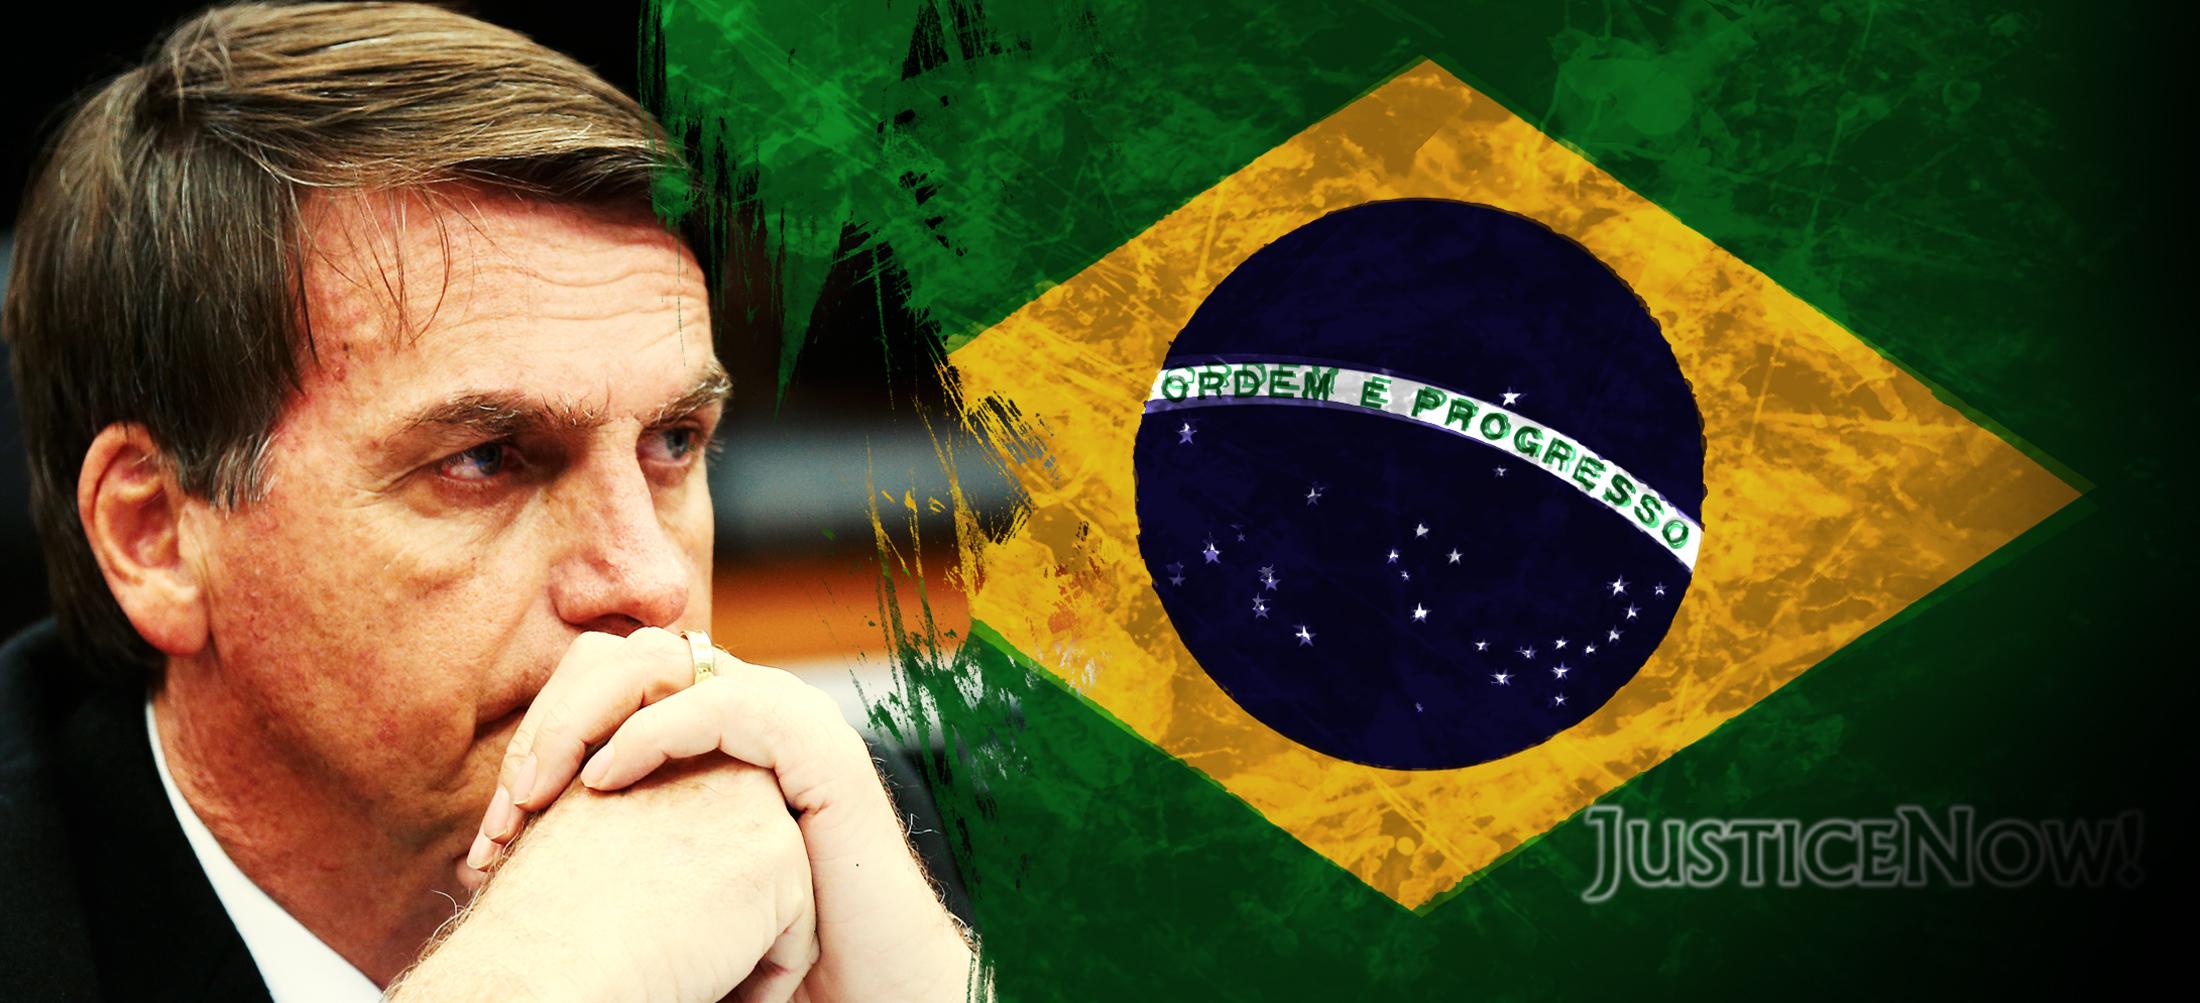 Bolsonaros Angriff auf Brasiliens Demokratie